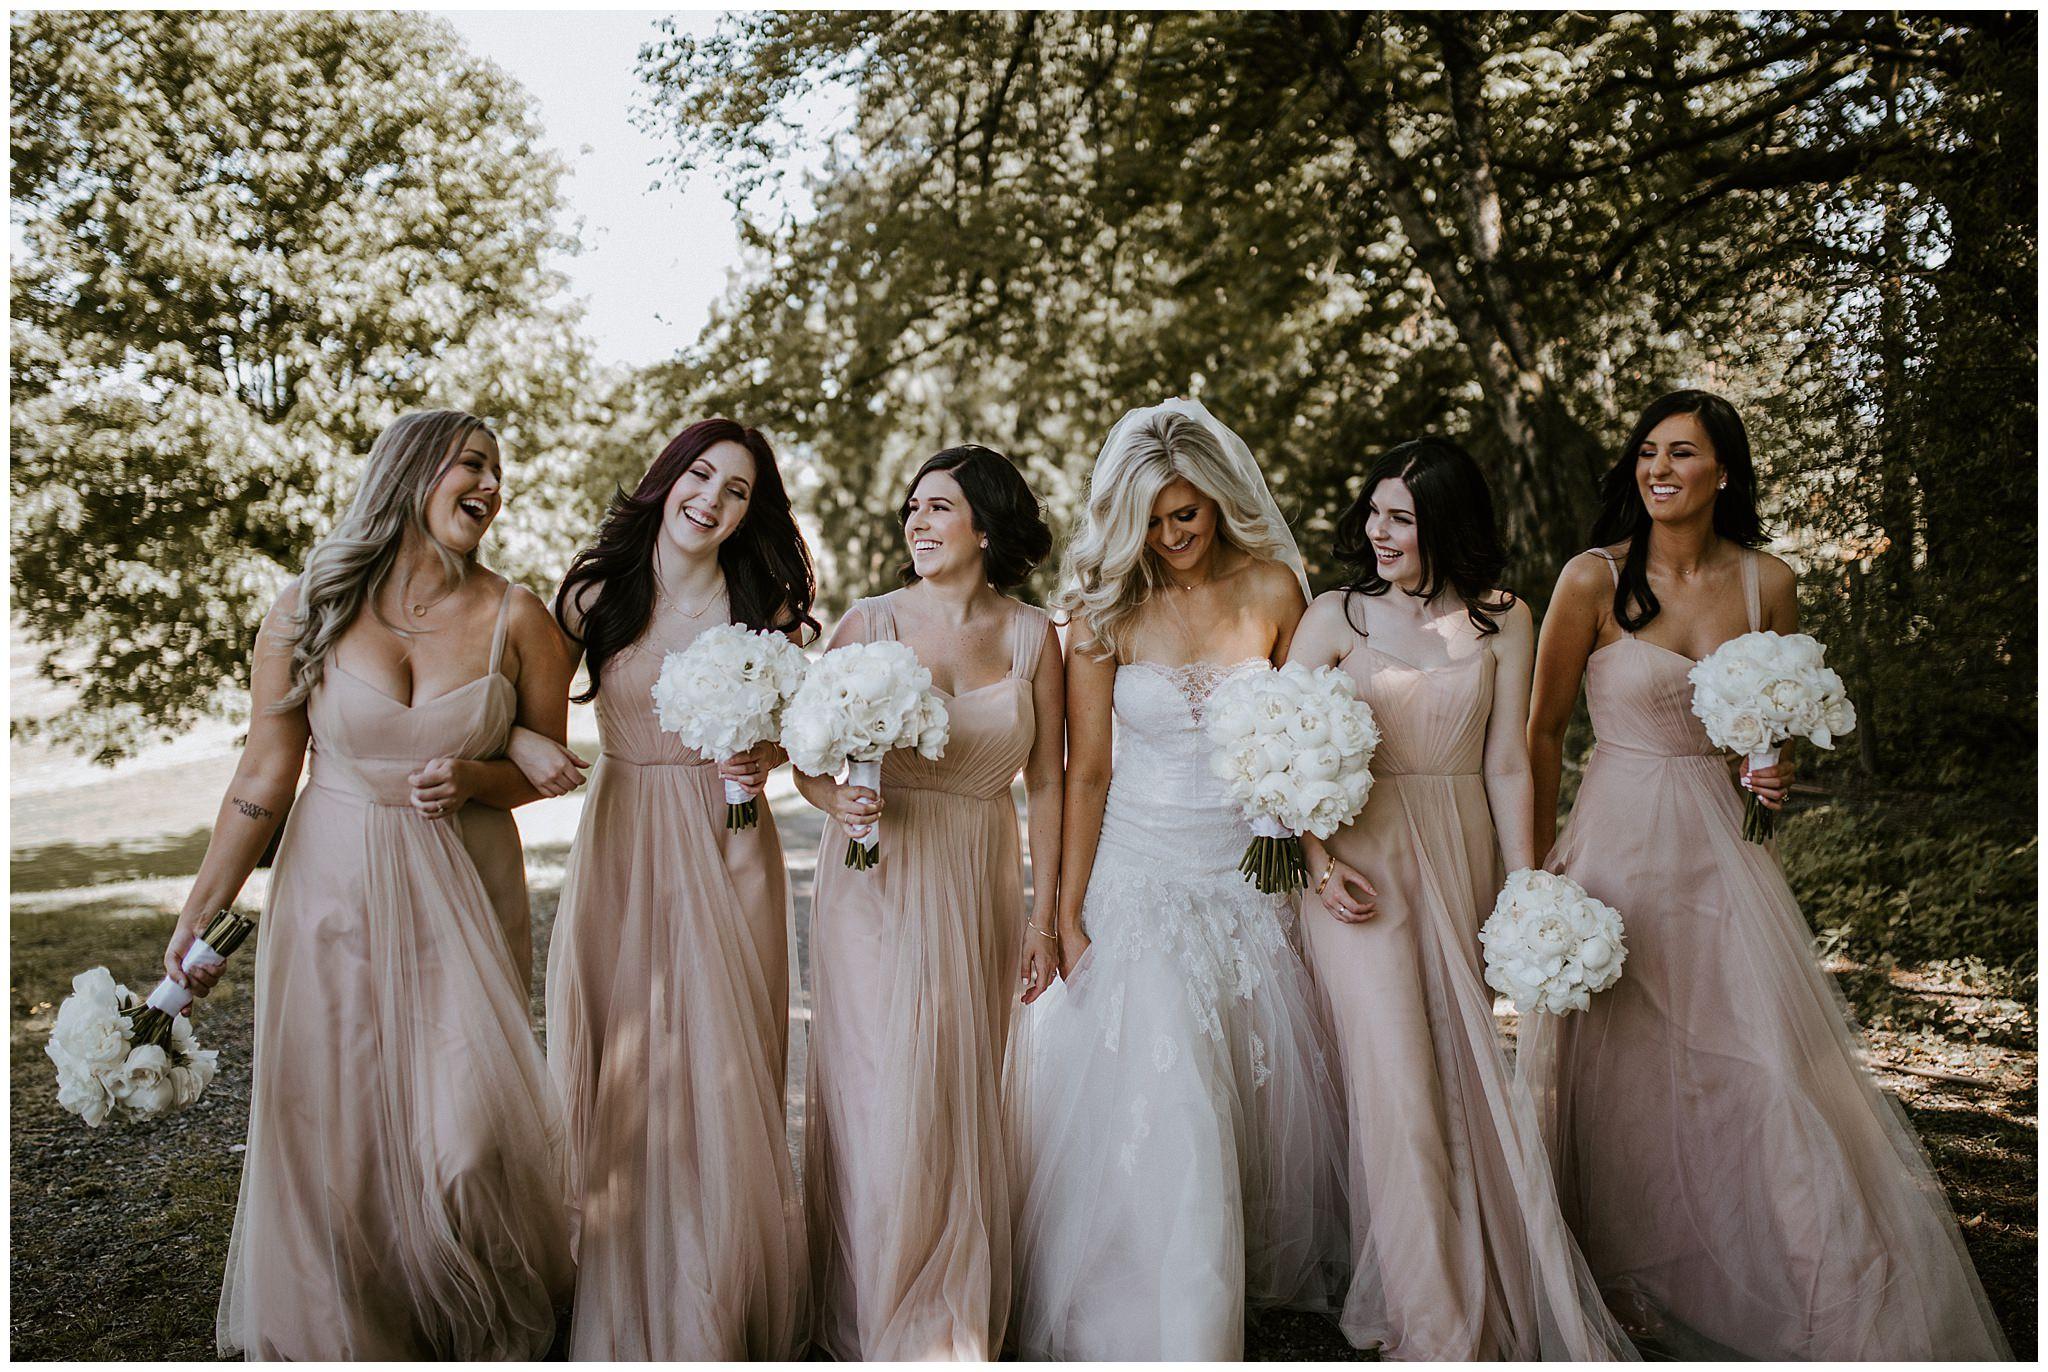 mt-lehman-winery-wedding-abbotsford-05.JPG